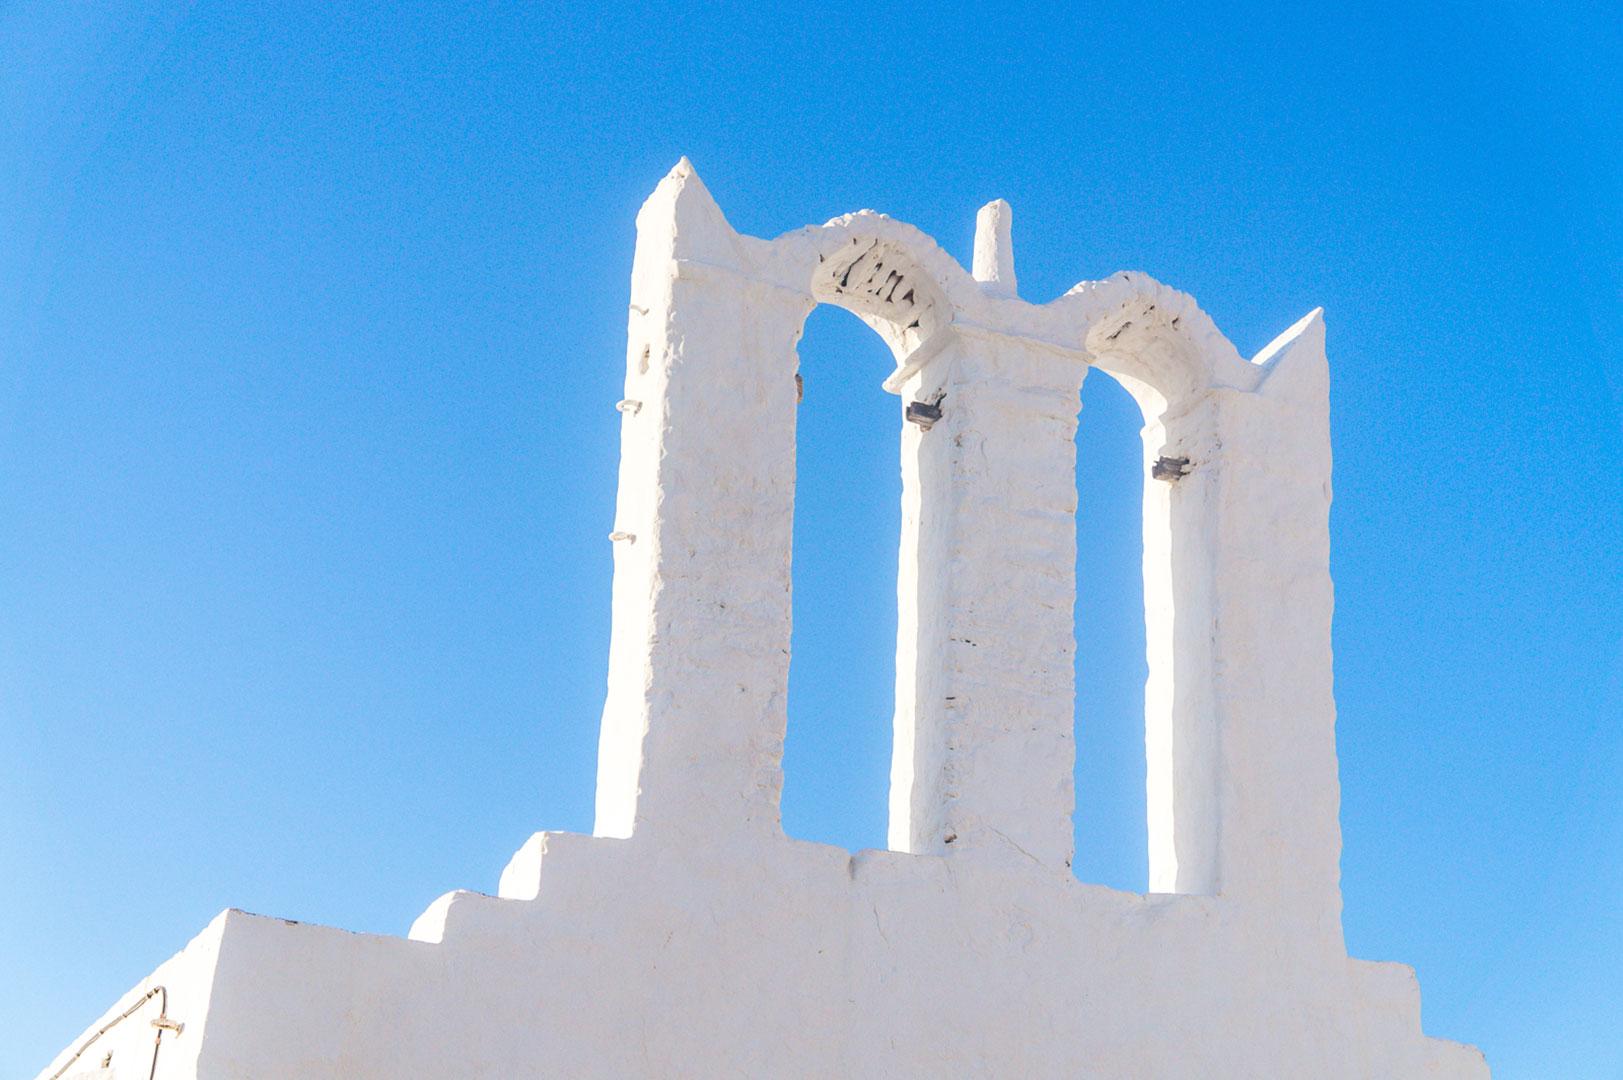 sifnos-greece-la-vie-en-blog-all-rights-reserved-10